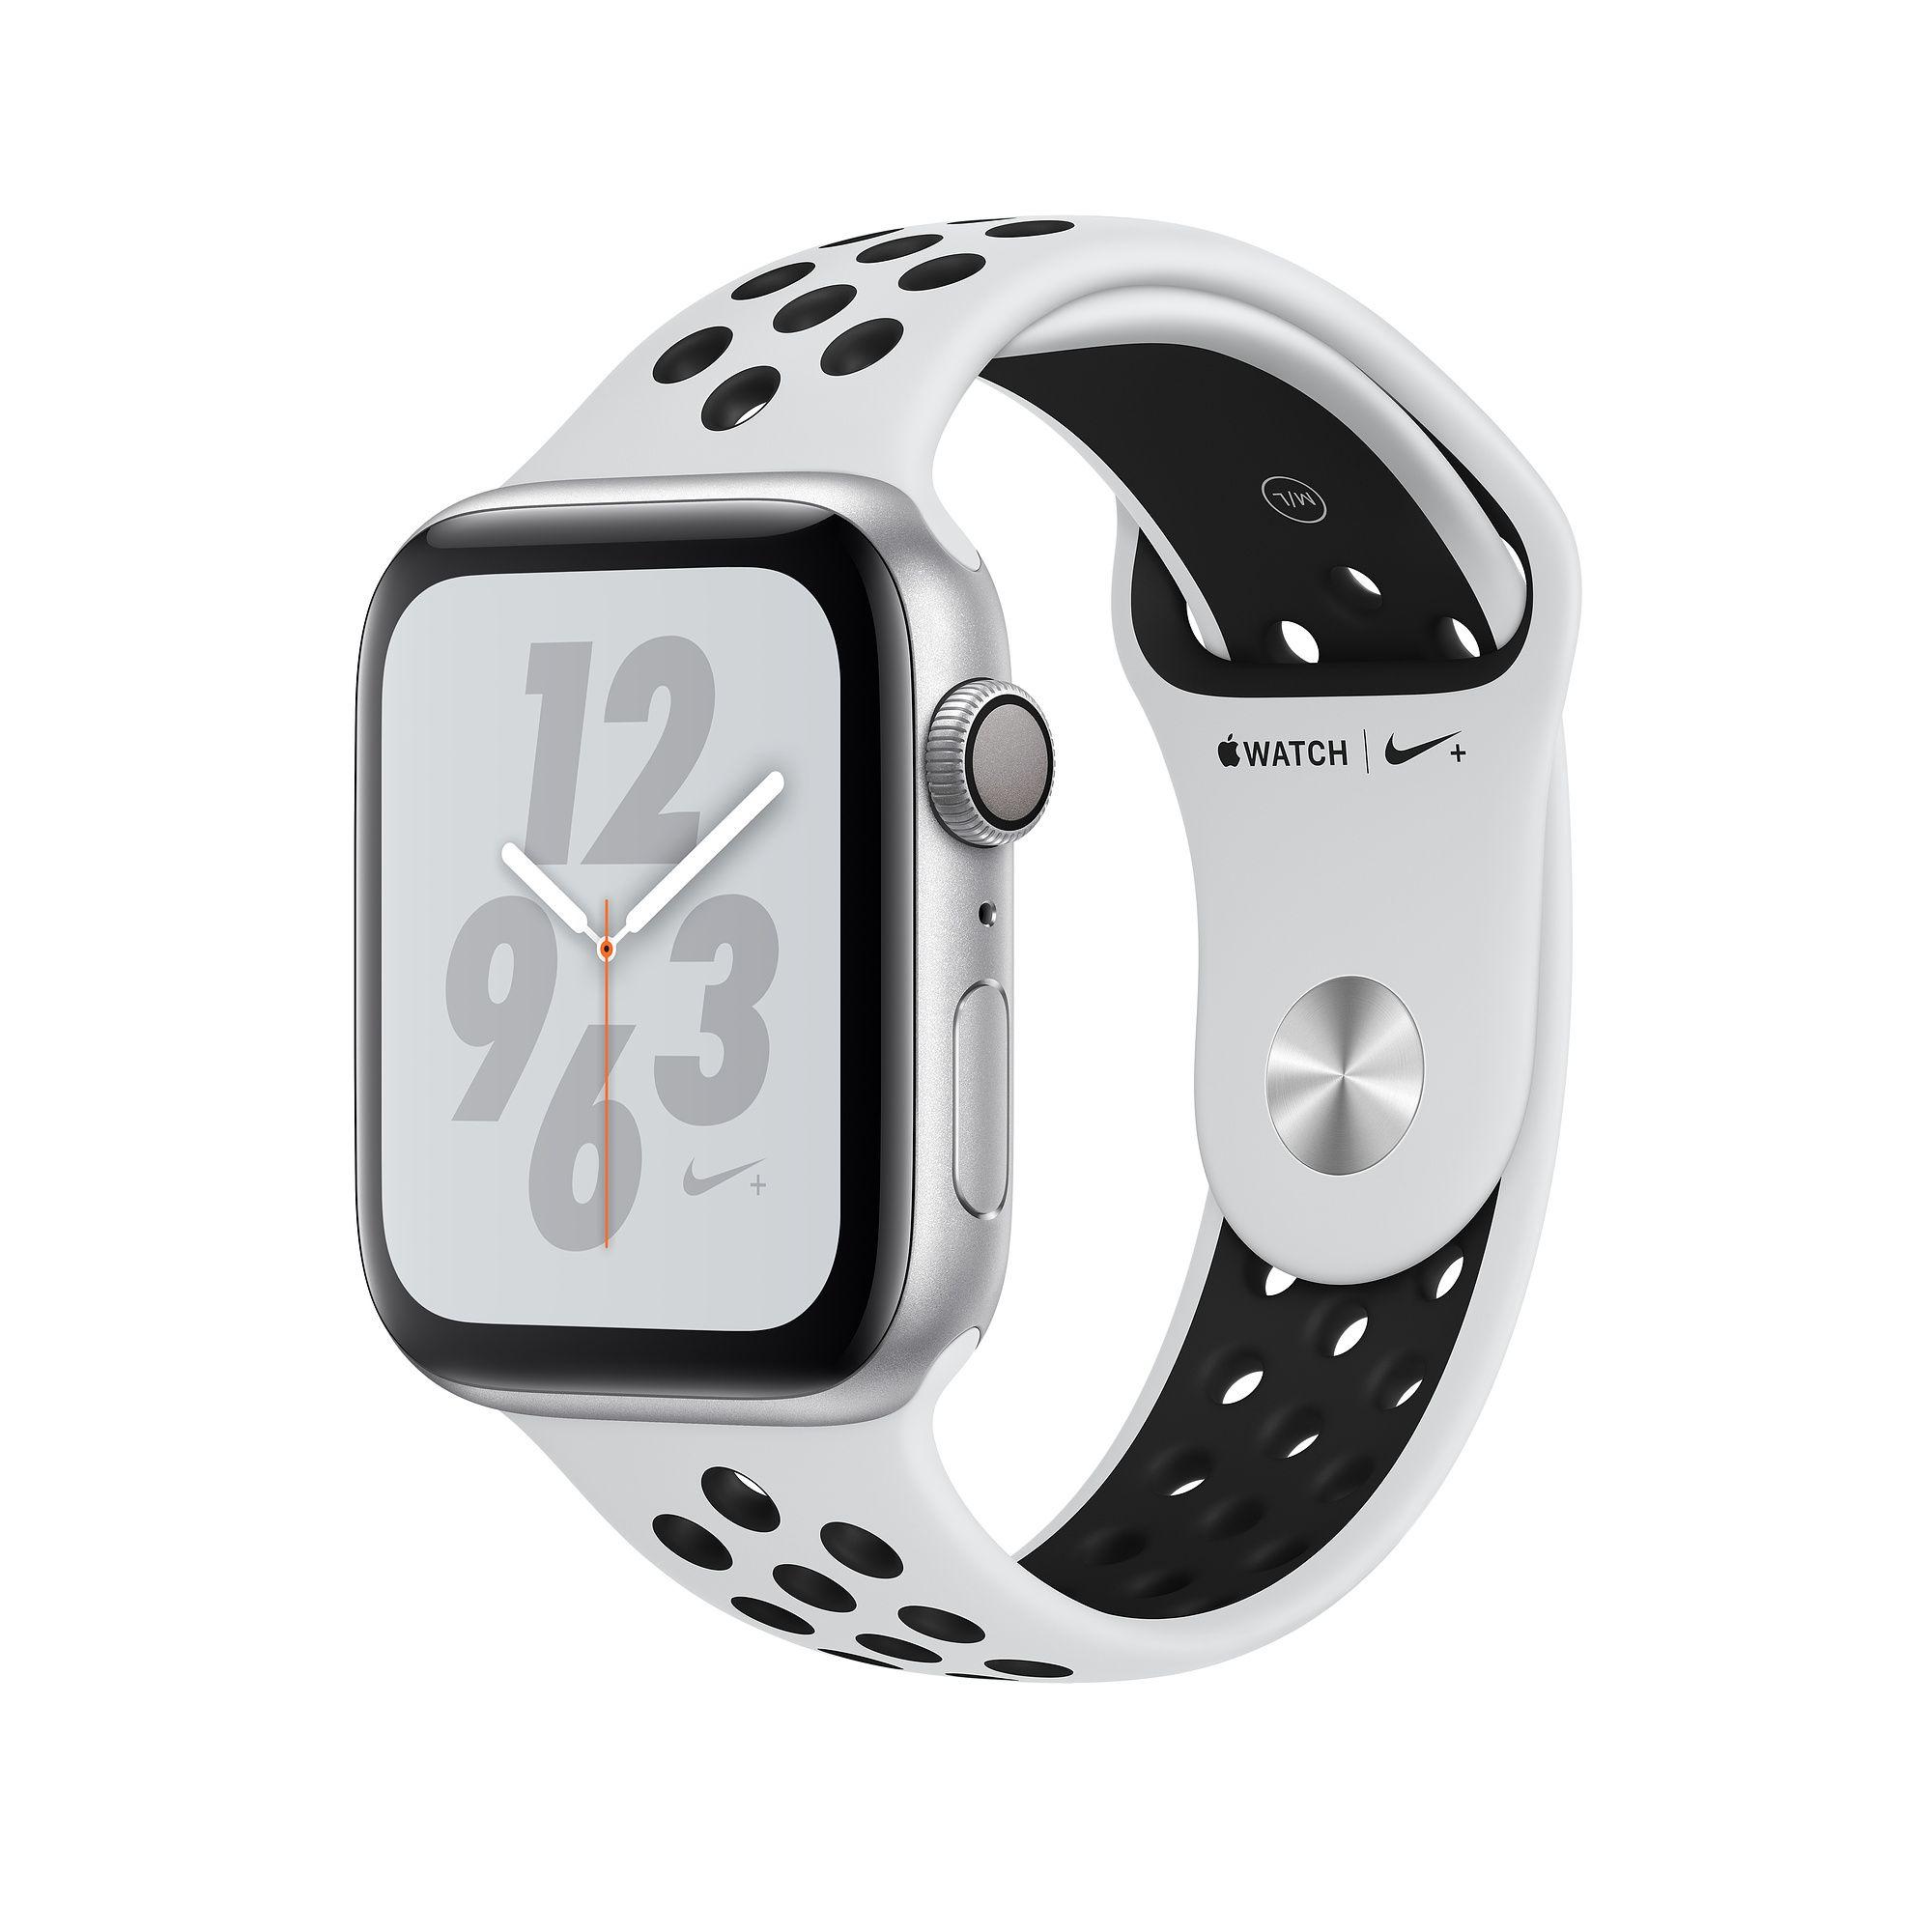 Apple Watch Nike+ Series 4 GPS, 44mm Silver Aluminum Case